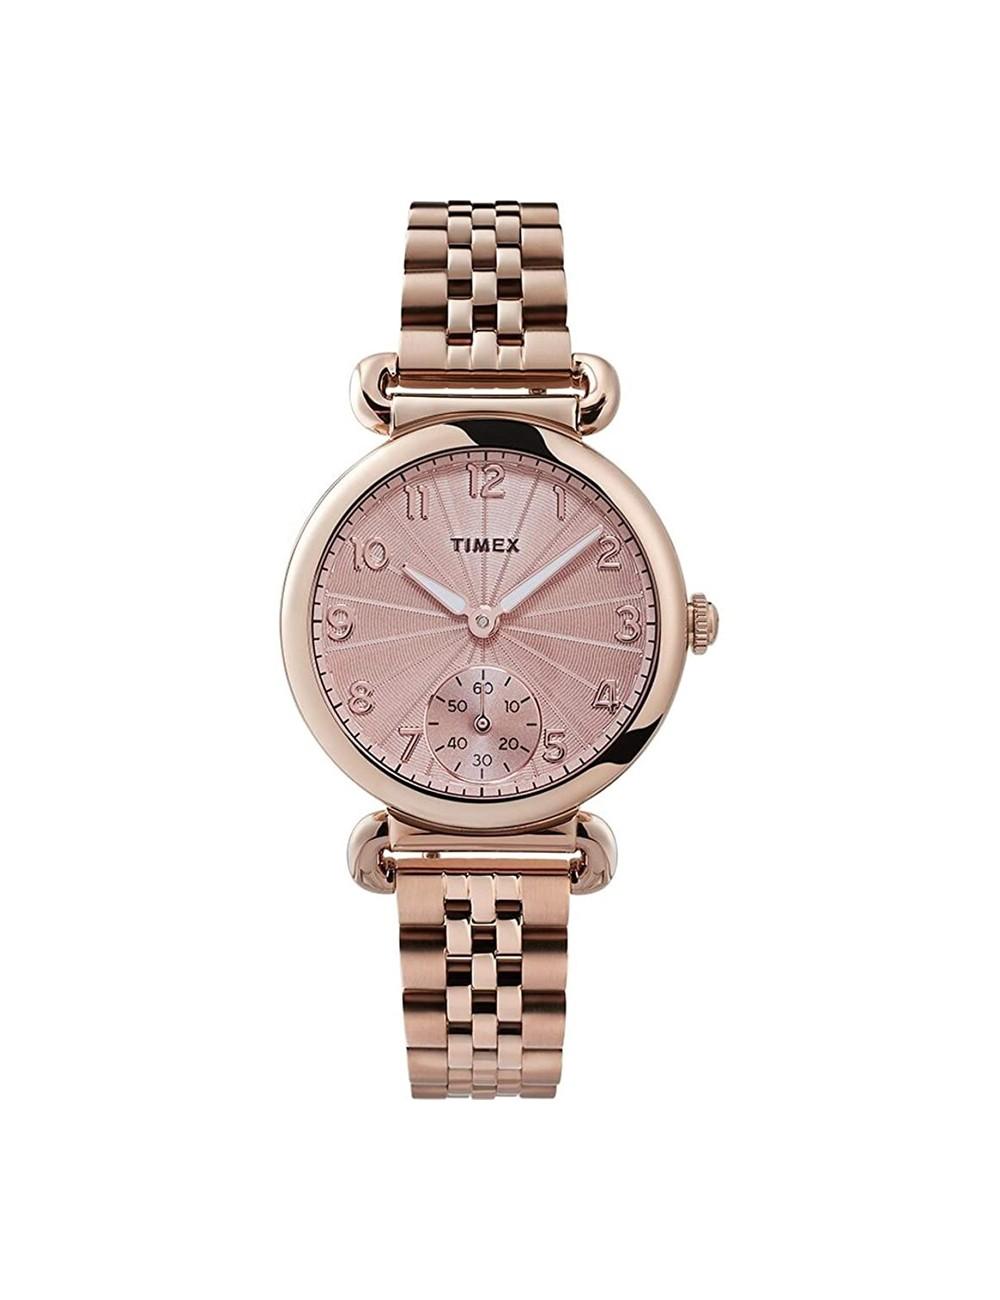 Timex Model 23 TW2T88500 Ladies Watch